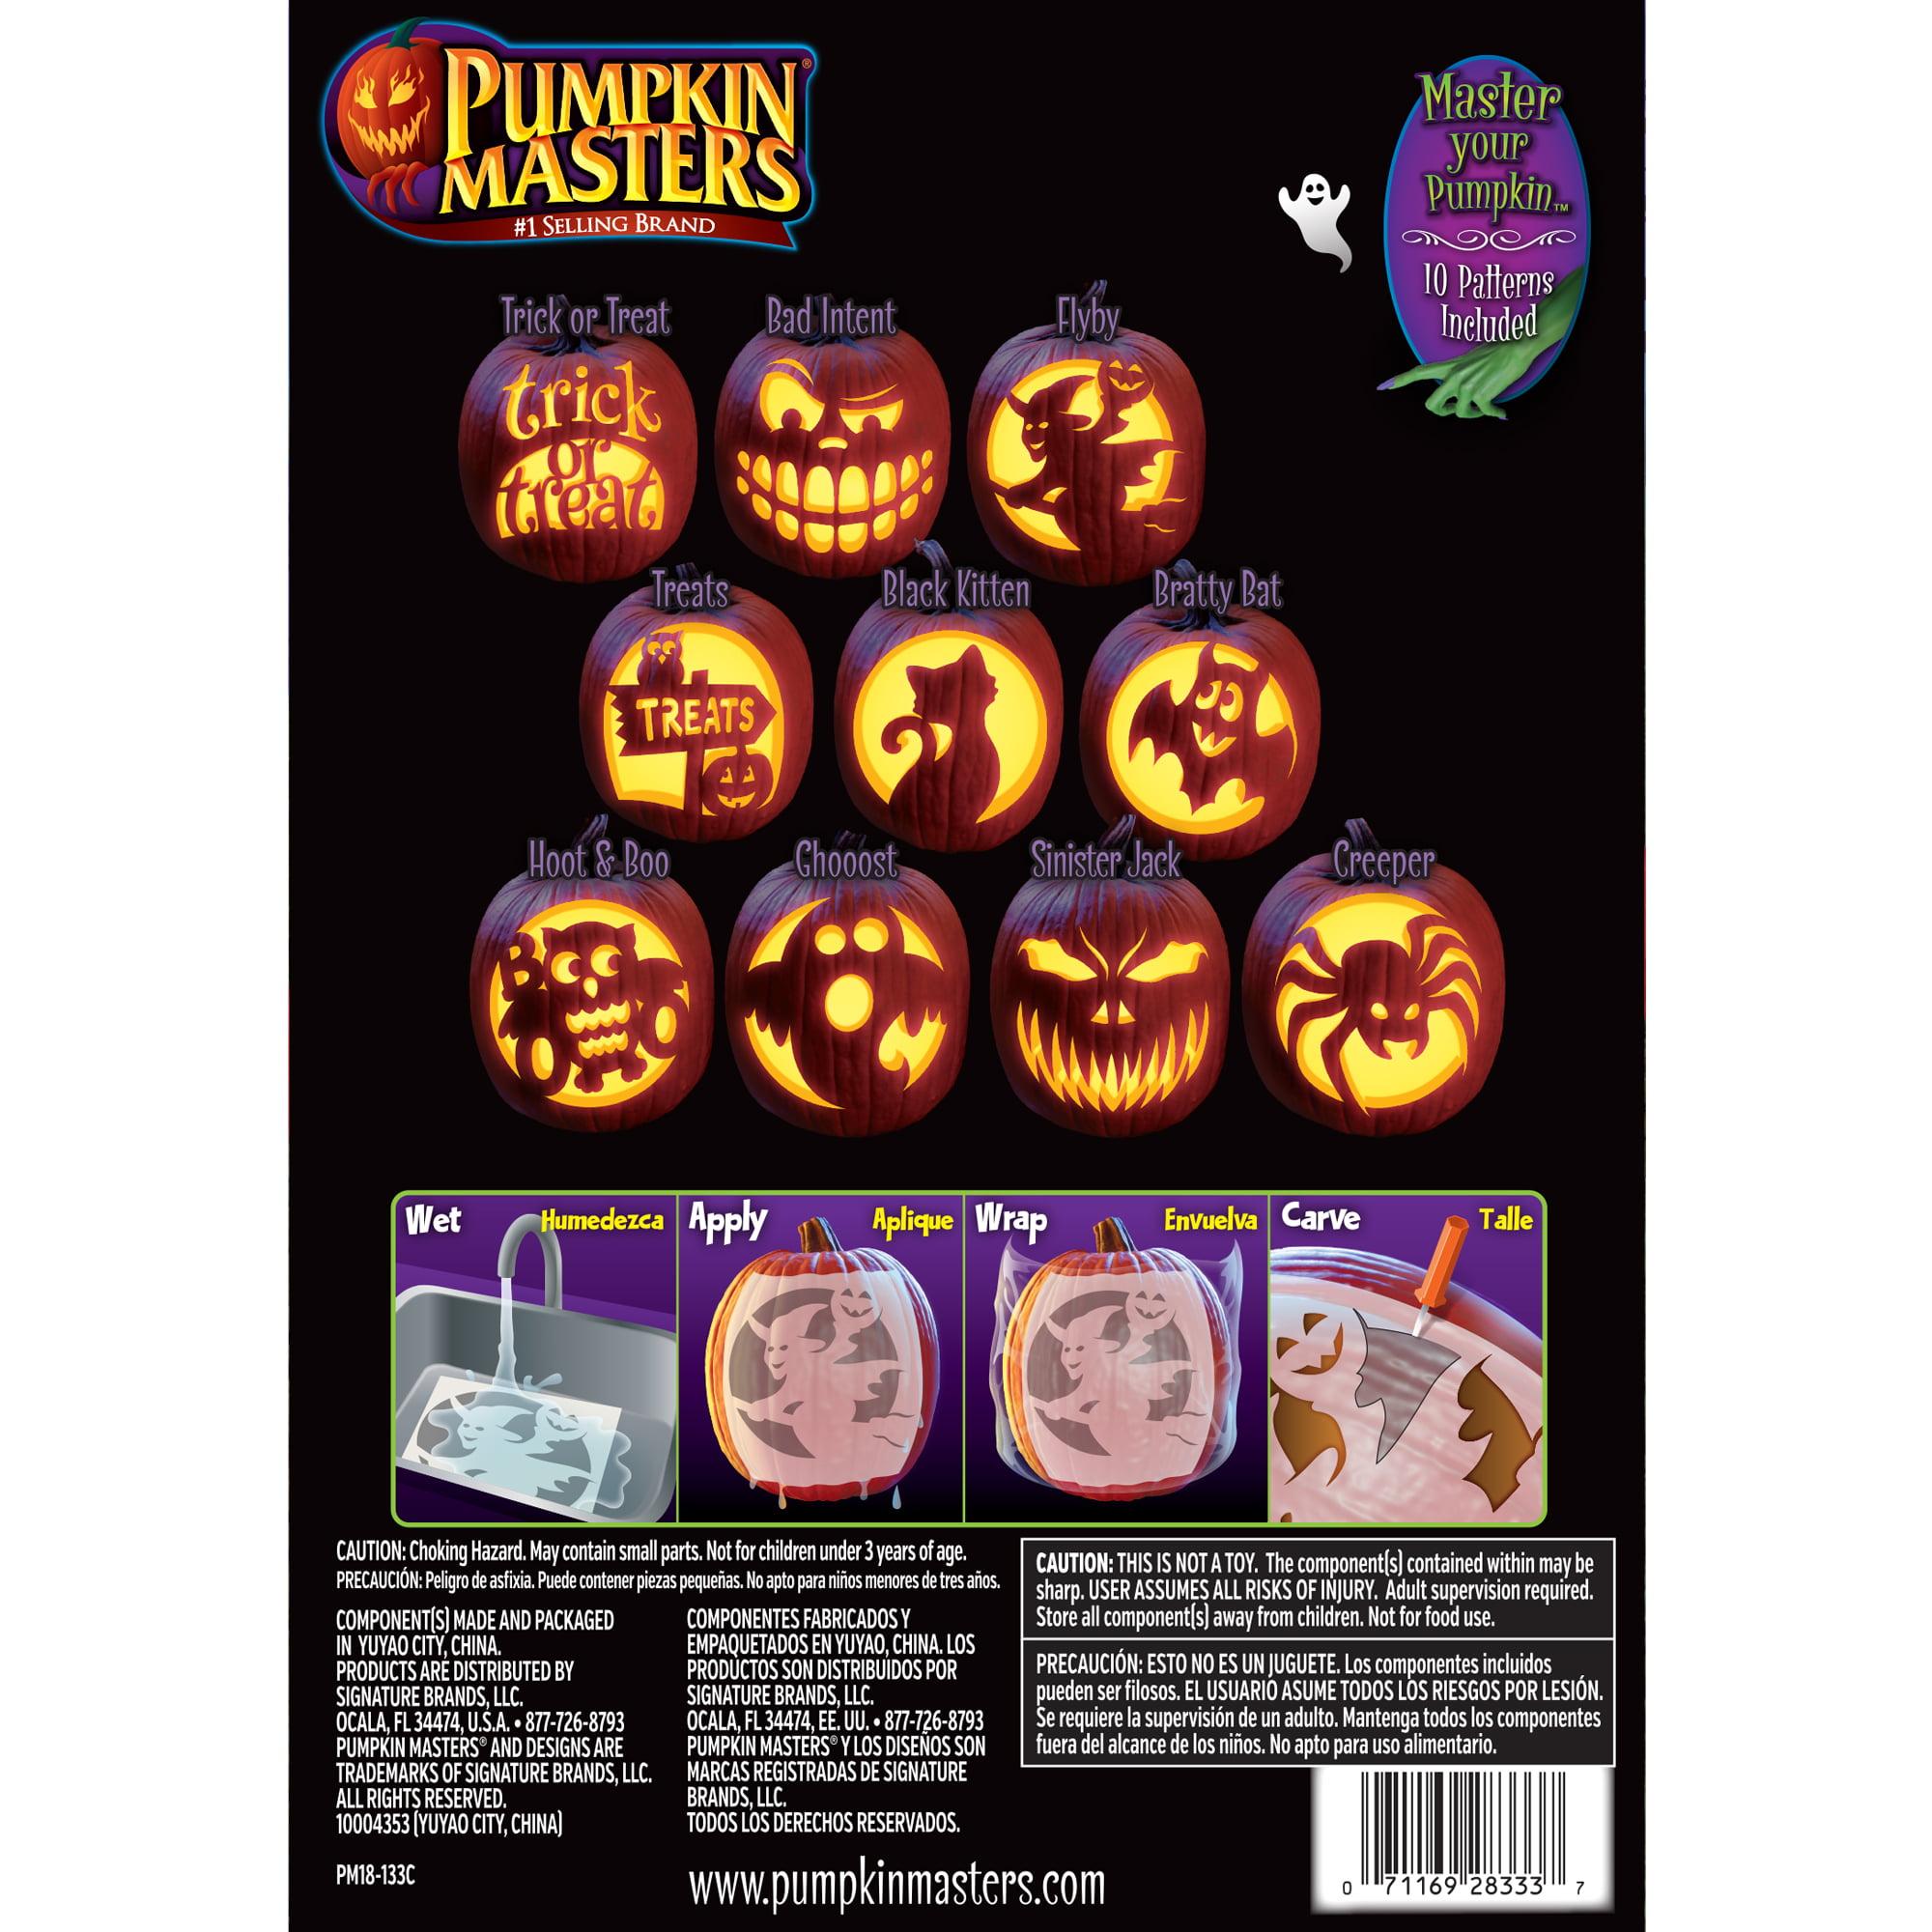 Pumpkin Masters Pumpkin Carving Kit Walmart